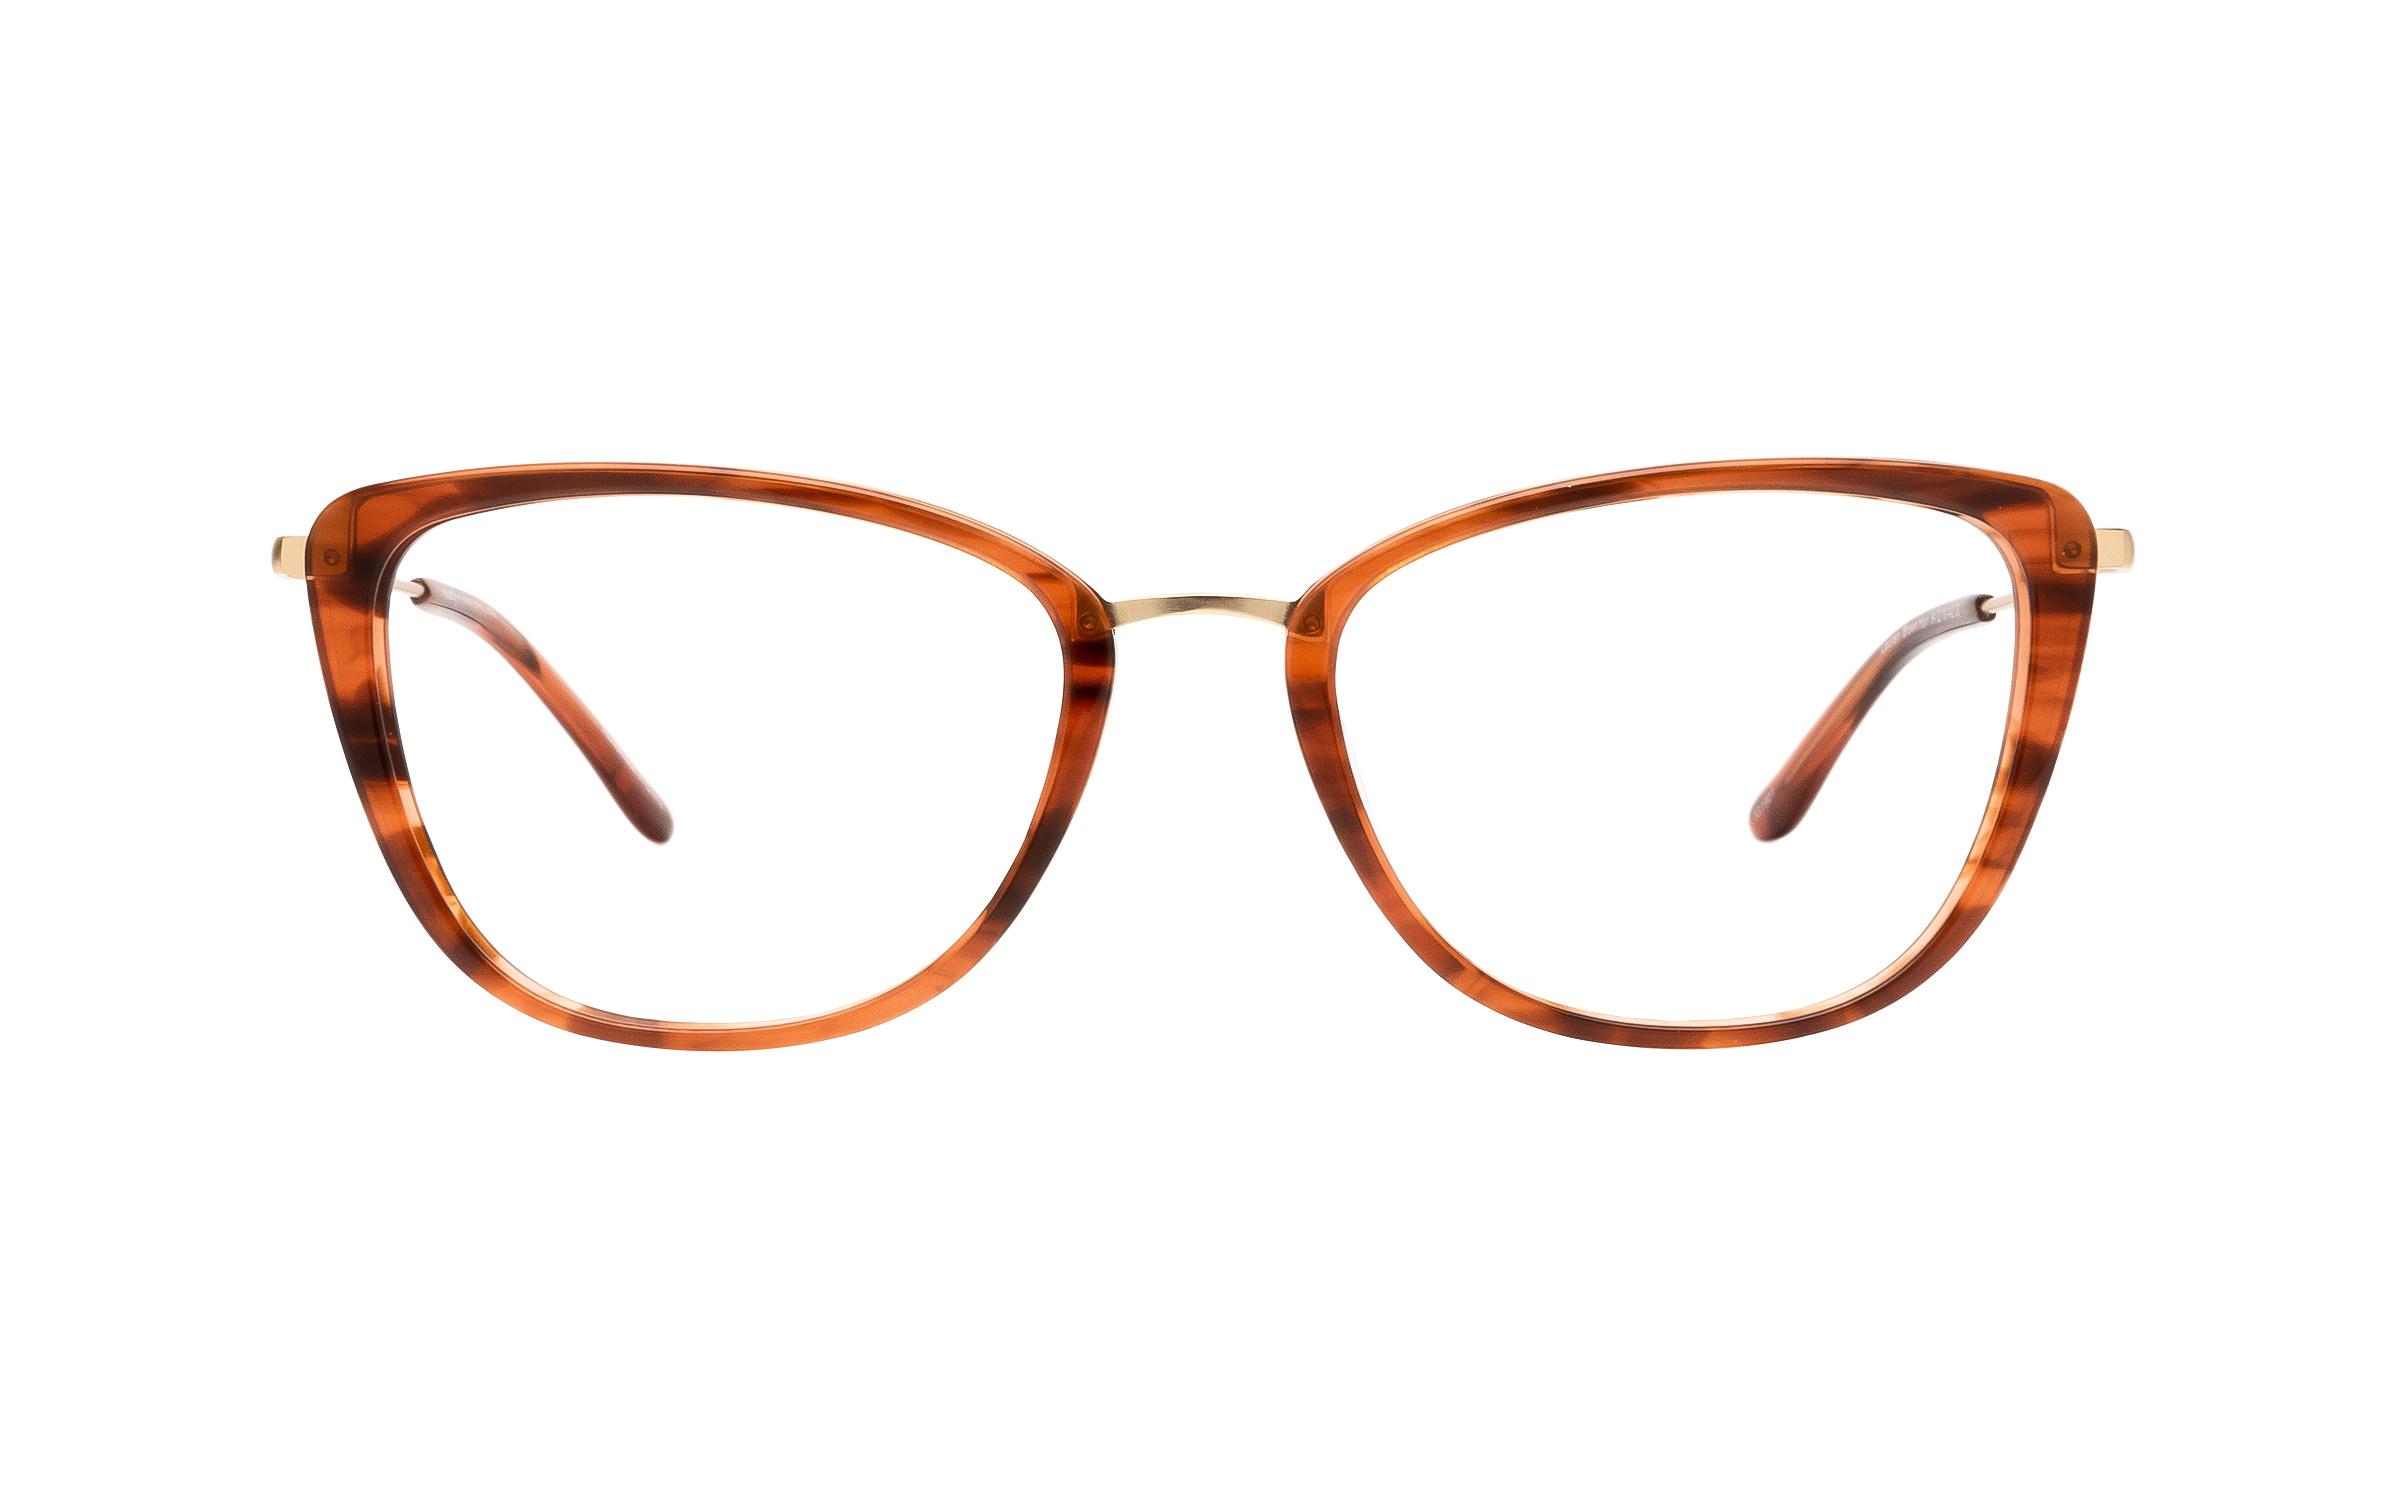 Kam Dhillon Lauren (54) Eyeglasses and Frame in Horn Brown | Acetate/Metal - Online Coastal